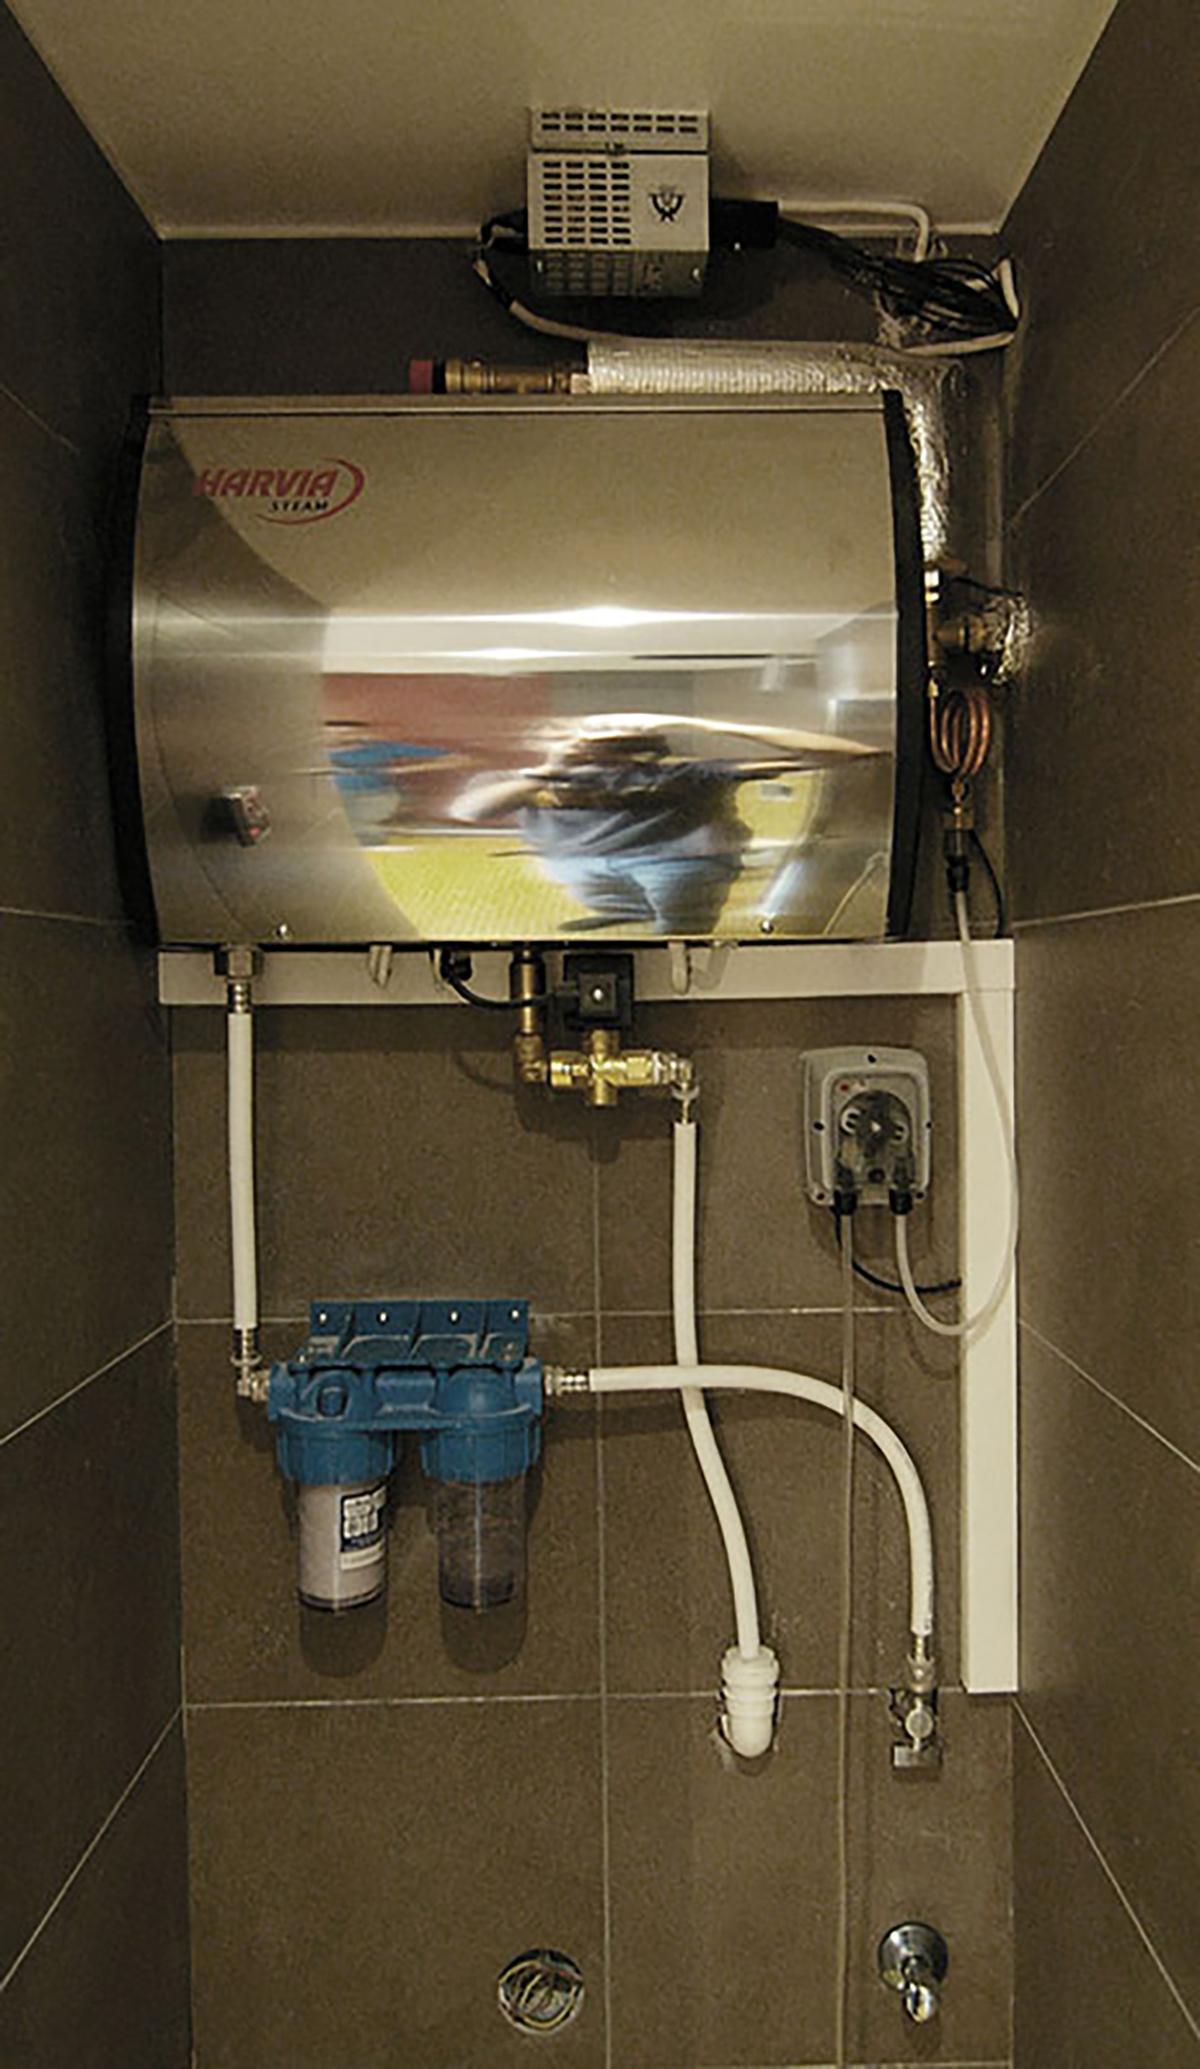 Harvia Steam инструкция - фото 3